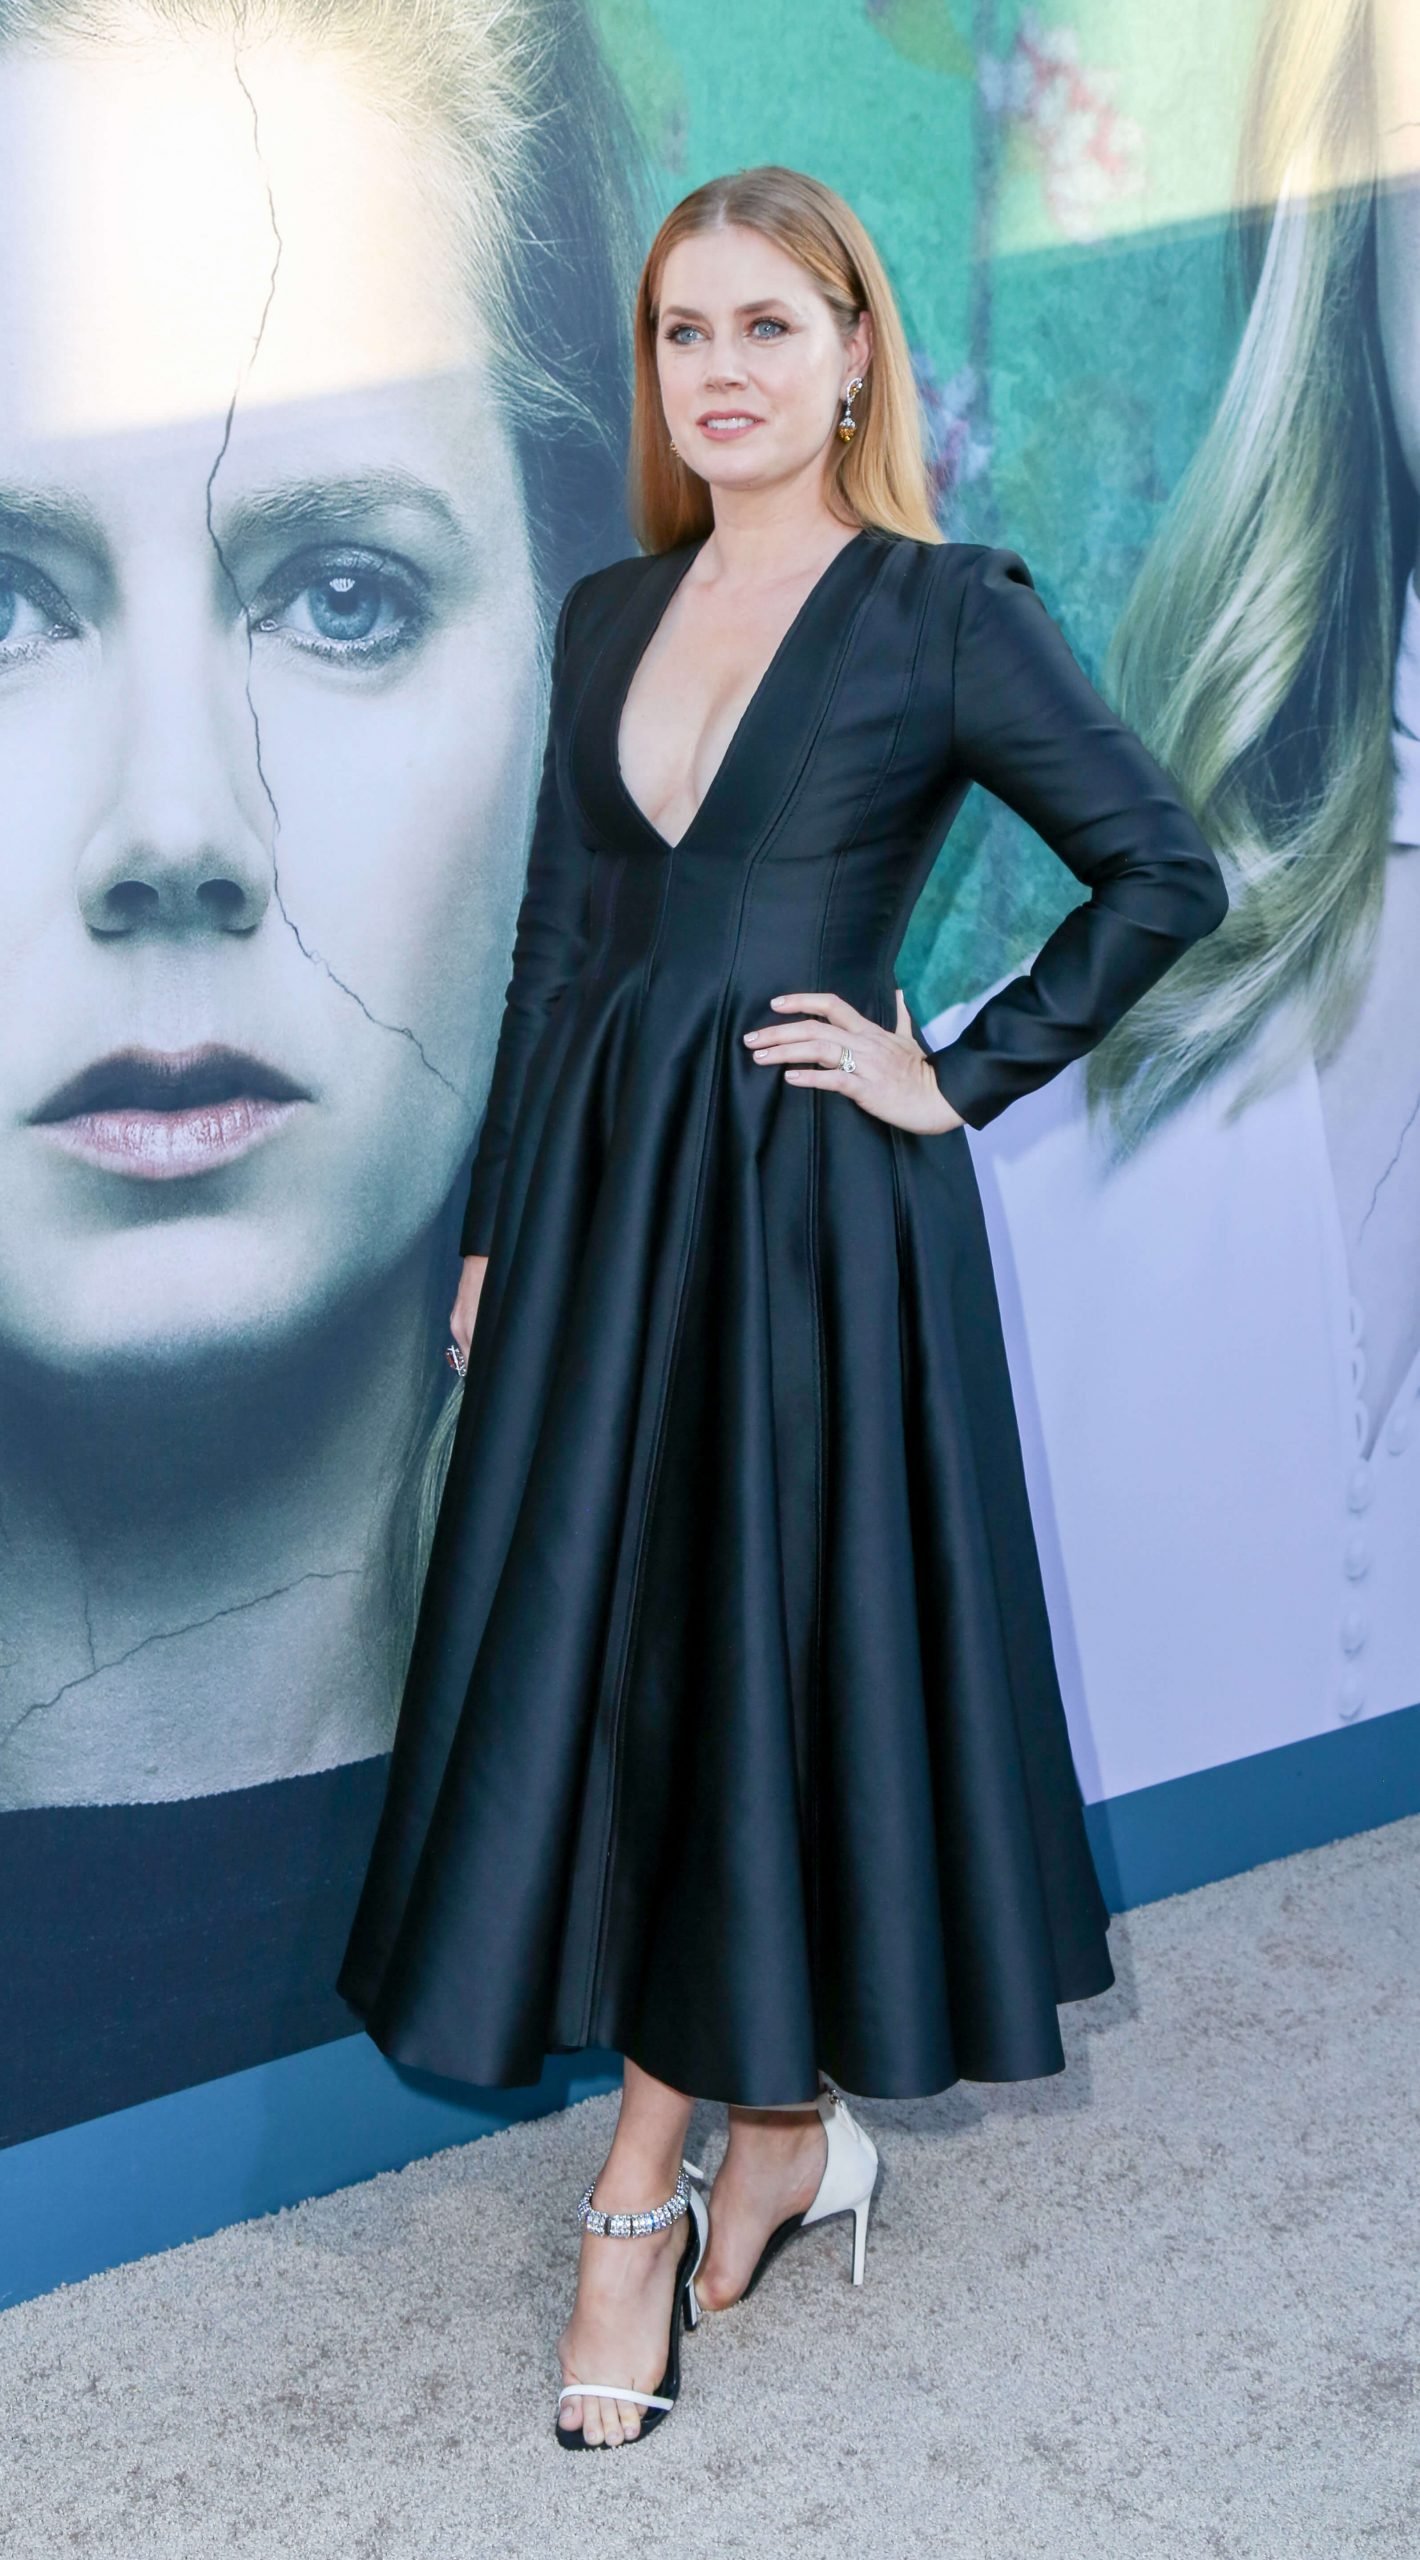 Amy Adams hairs